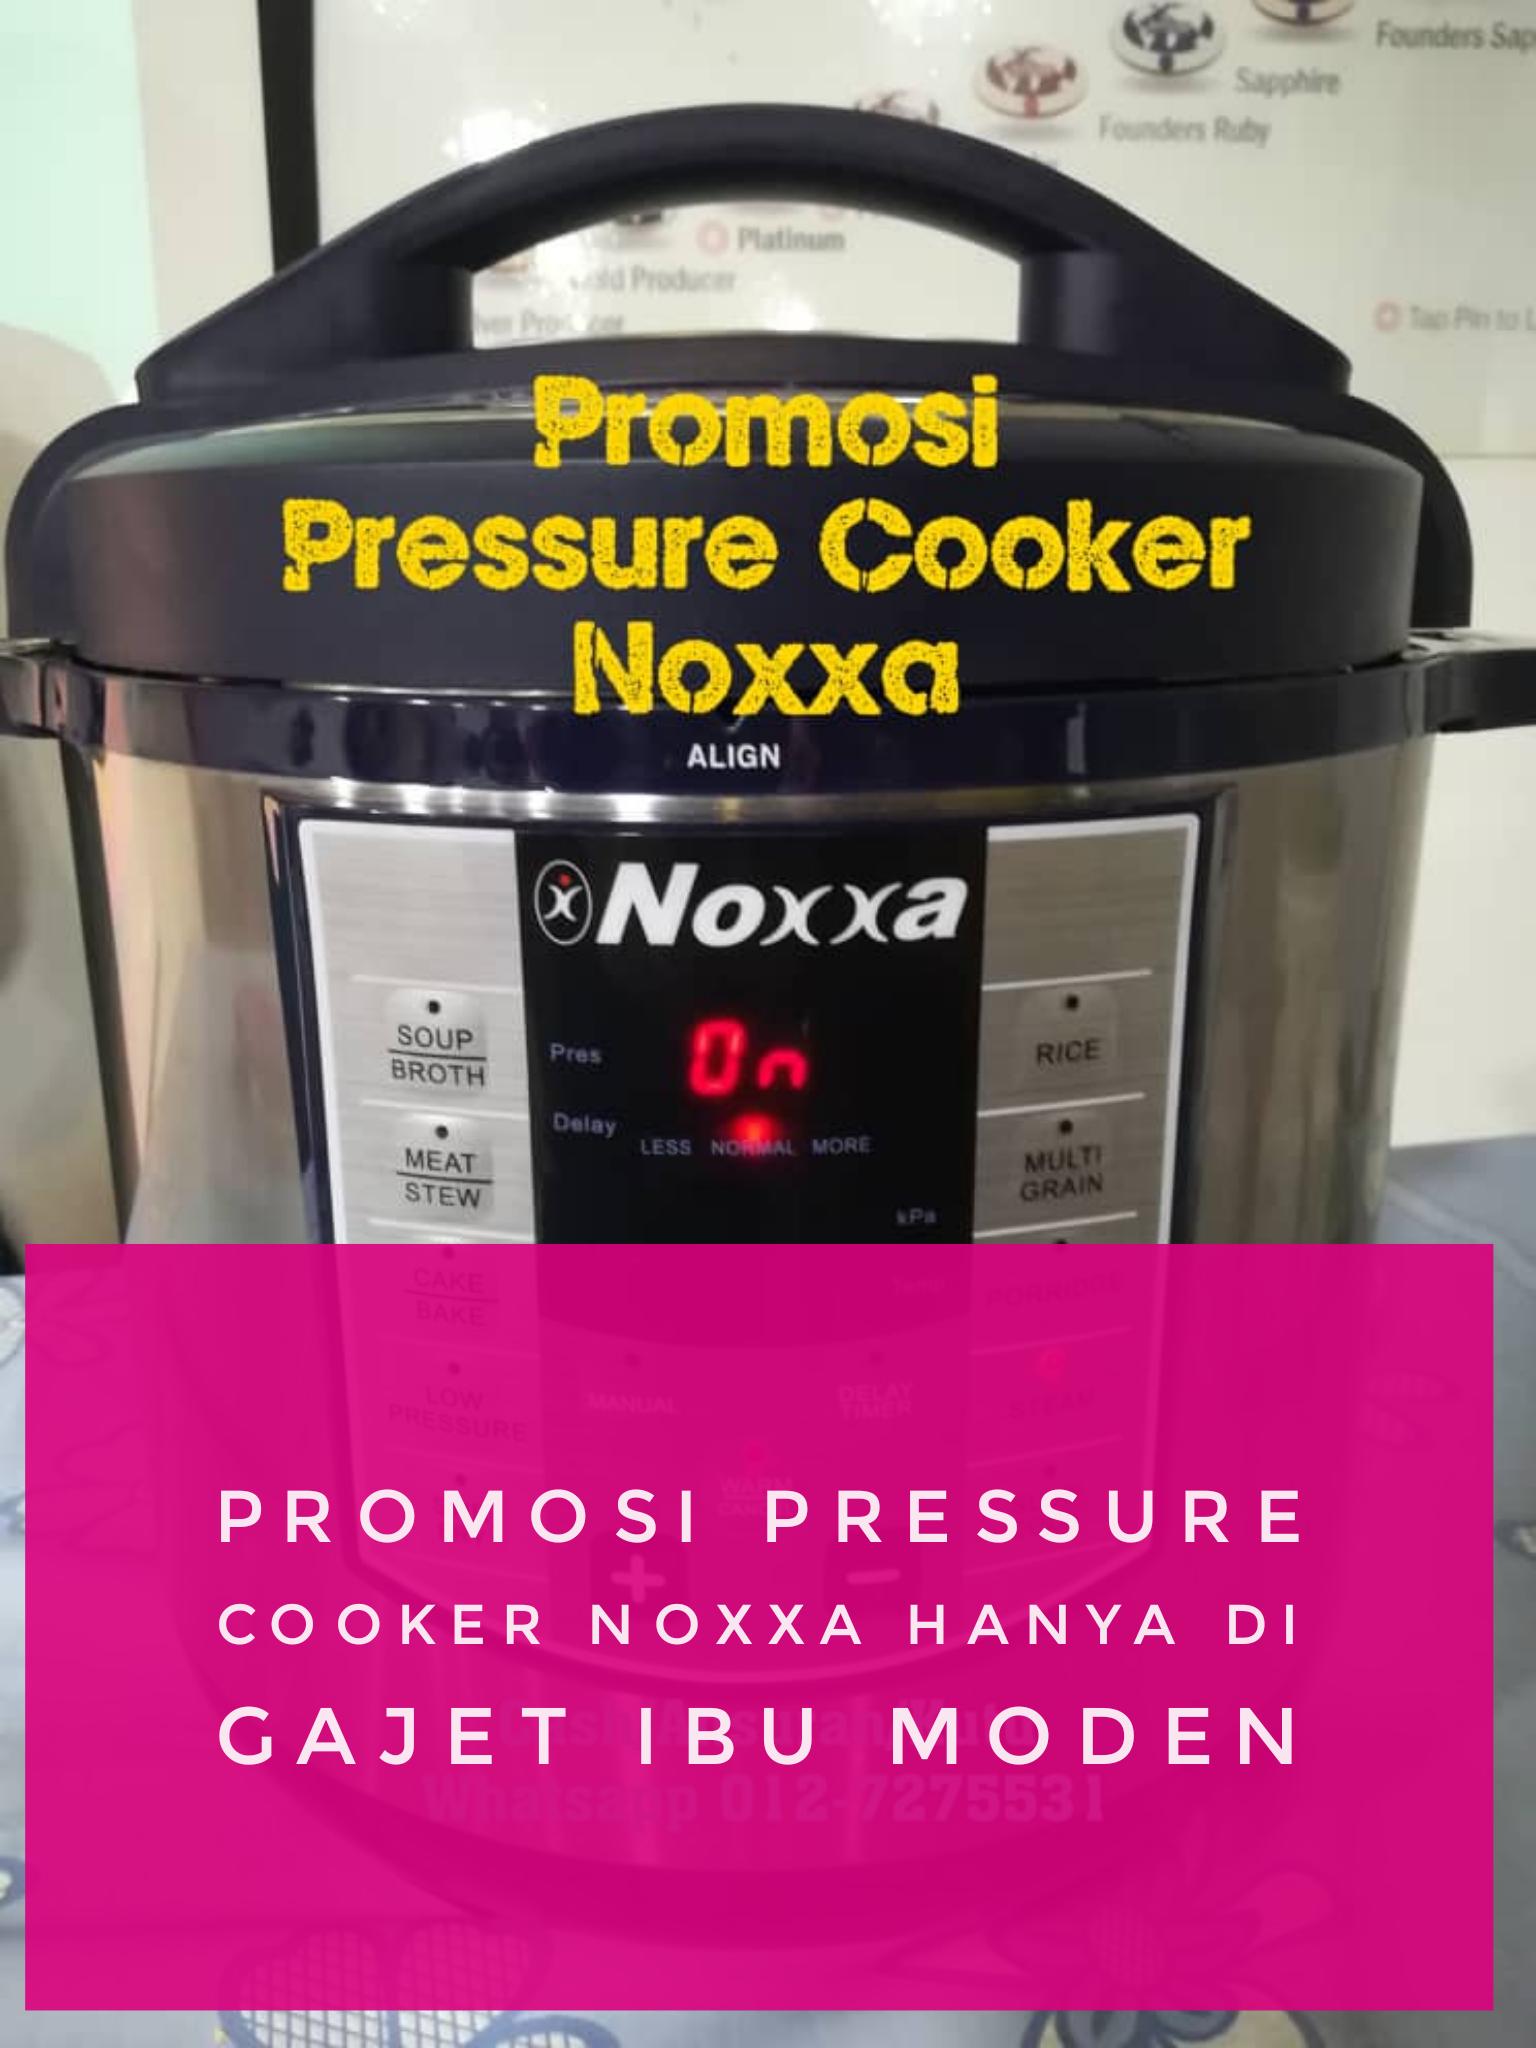 Promosi Pressure Cooker Noxxa Sehingga 14 Oktober 2019 Hanya di Gajet Ibu Moden